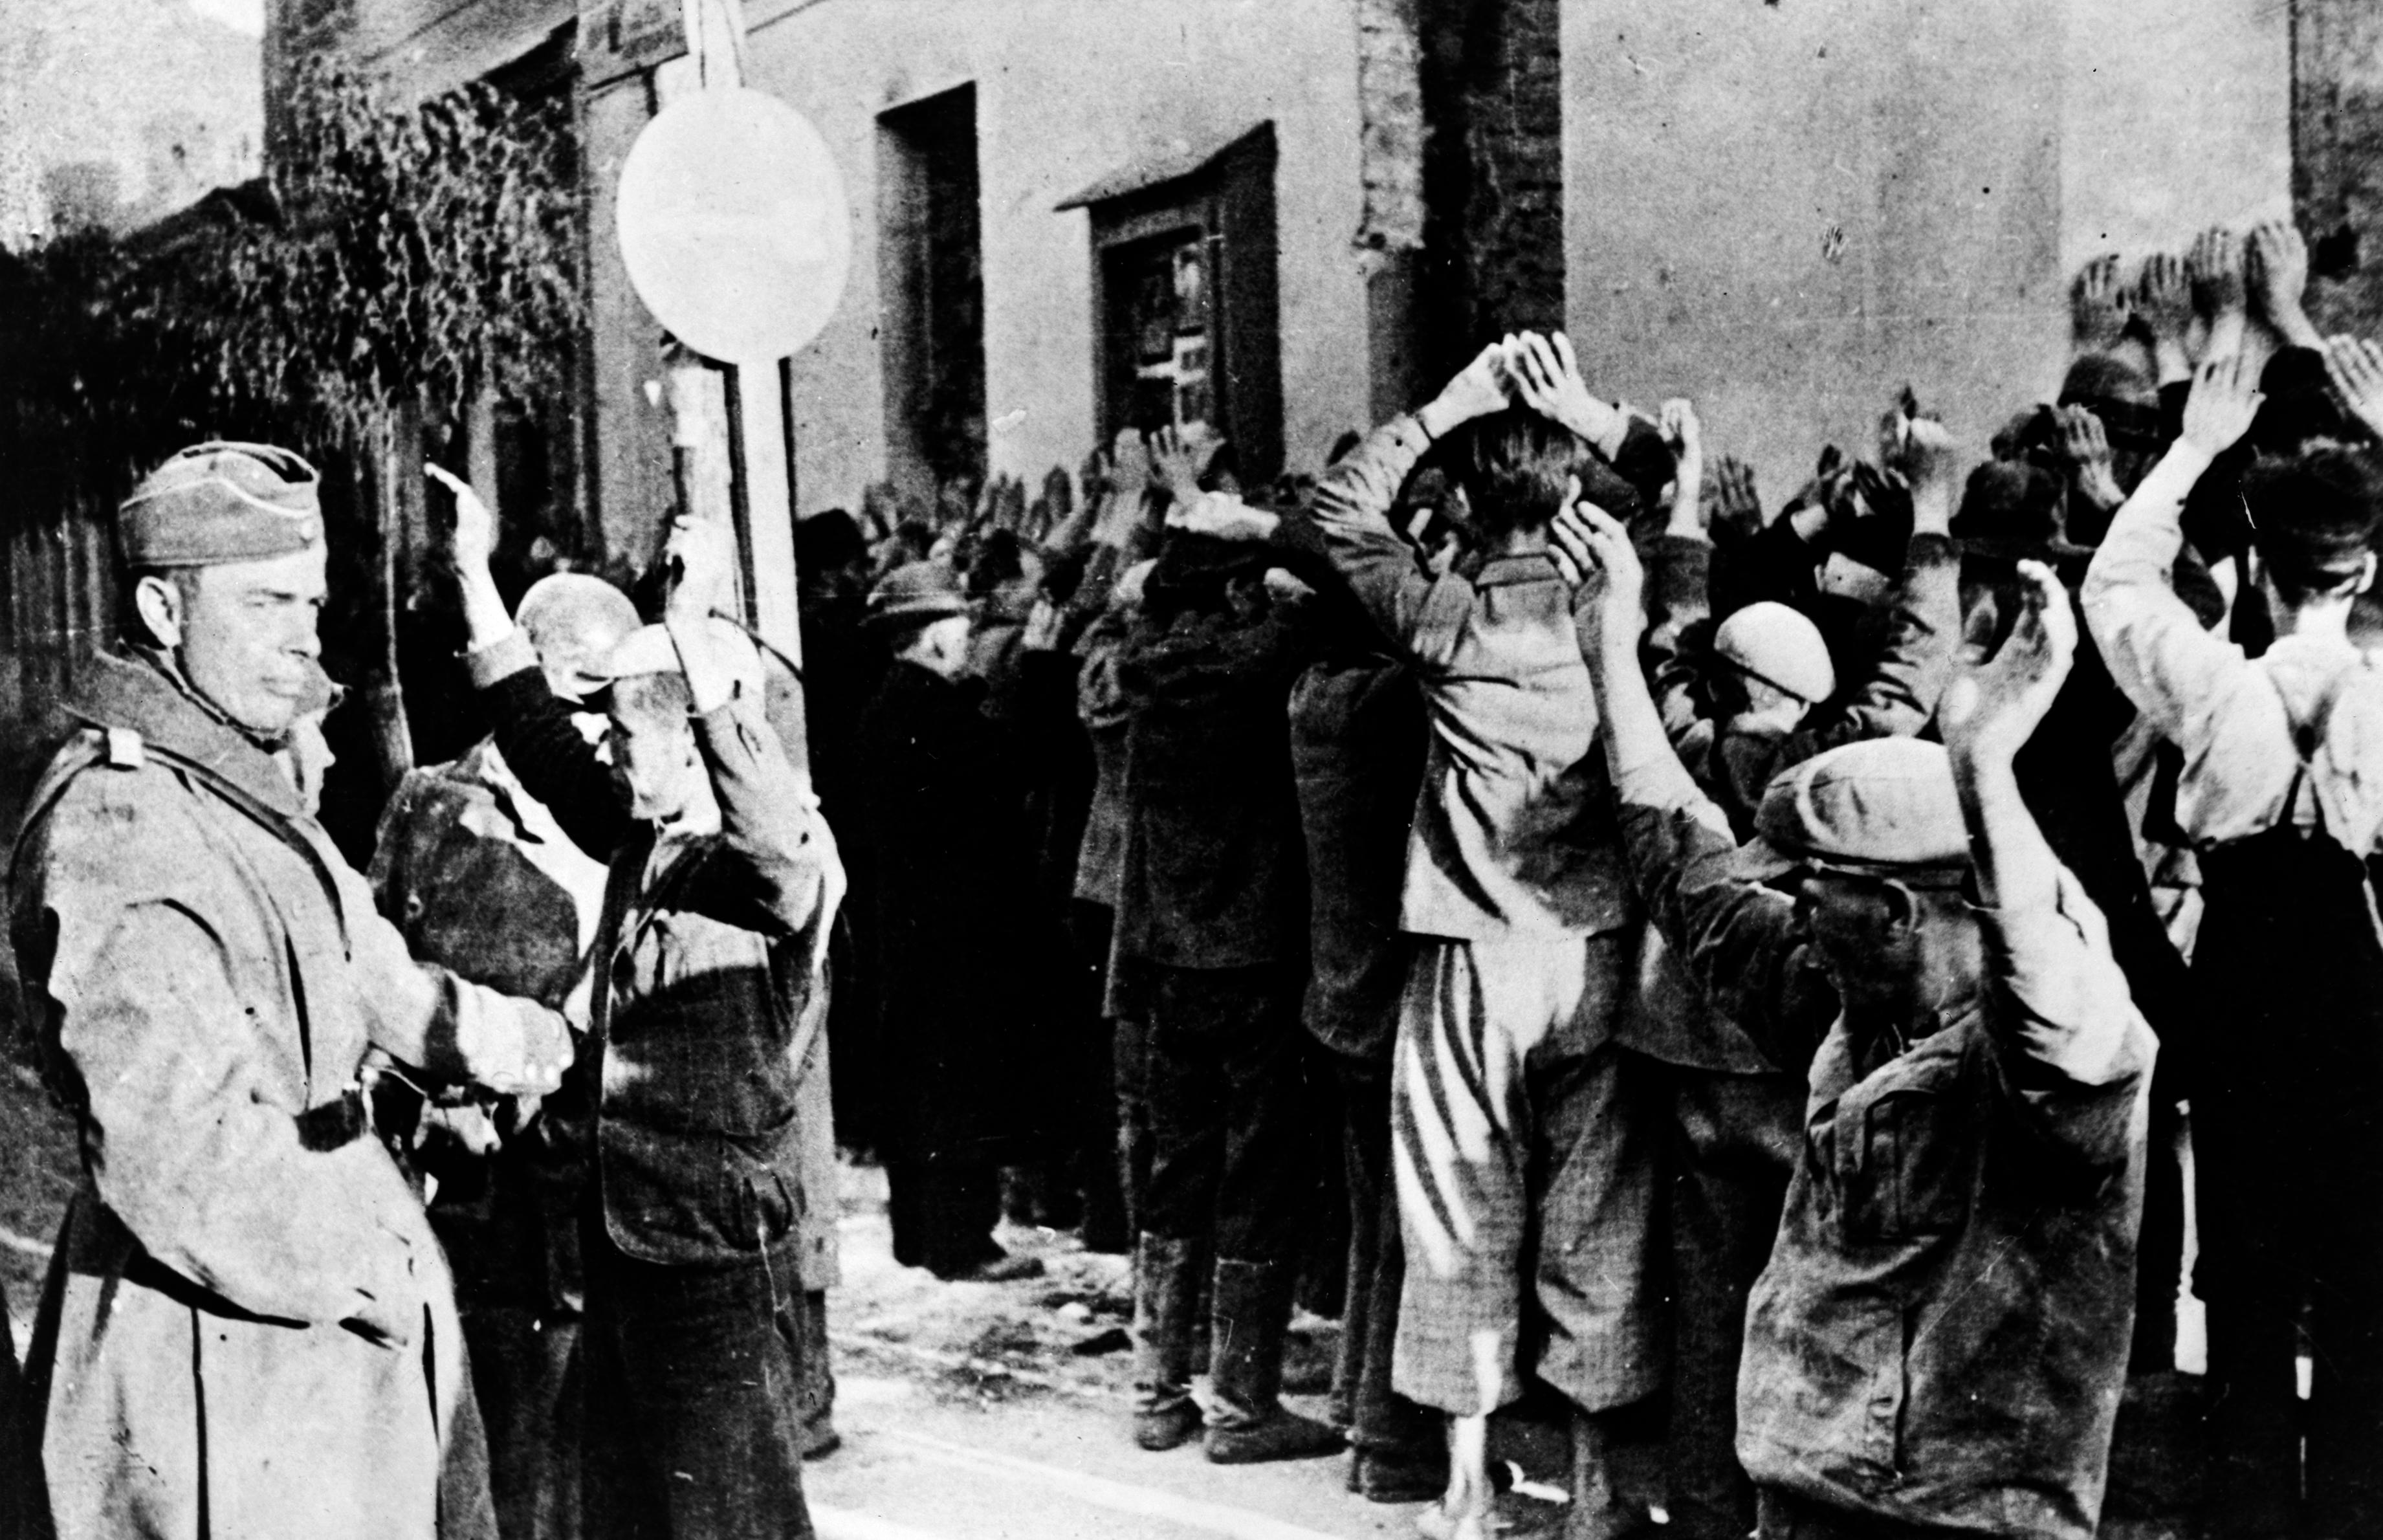 The Holocaust: The Range of Responses